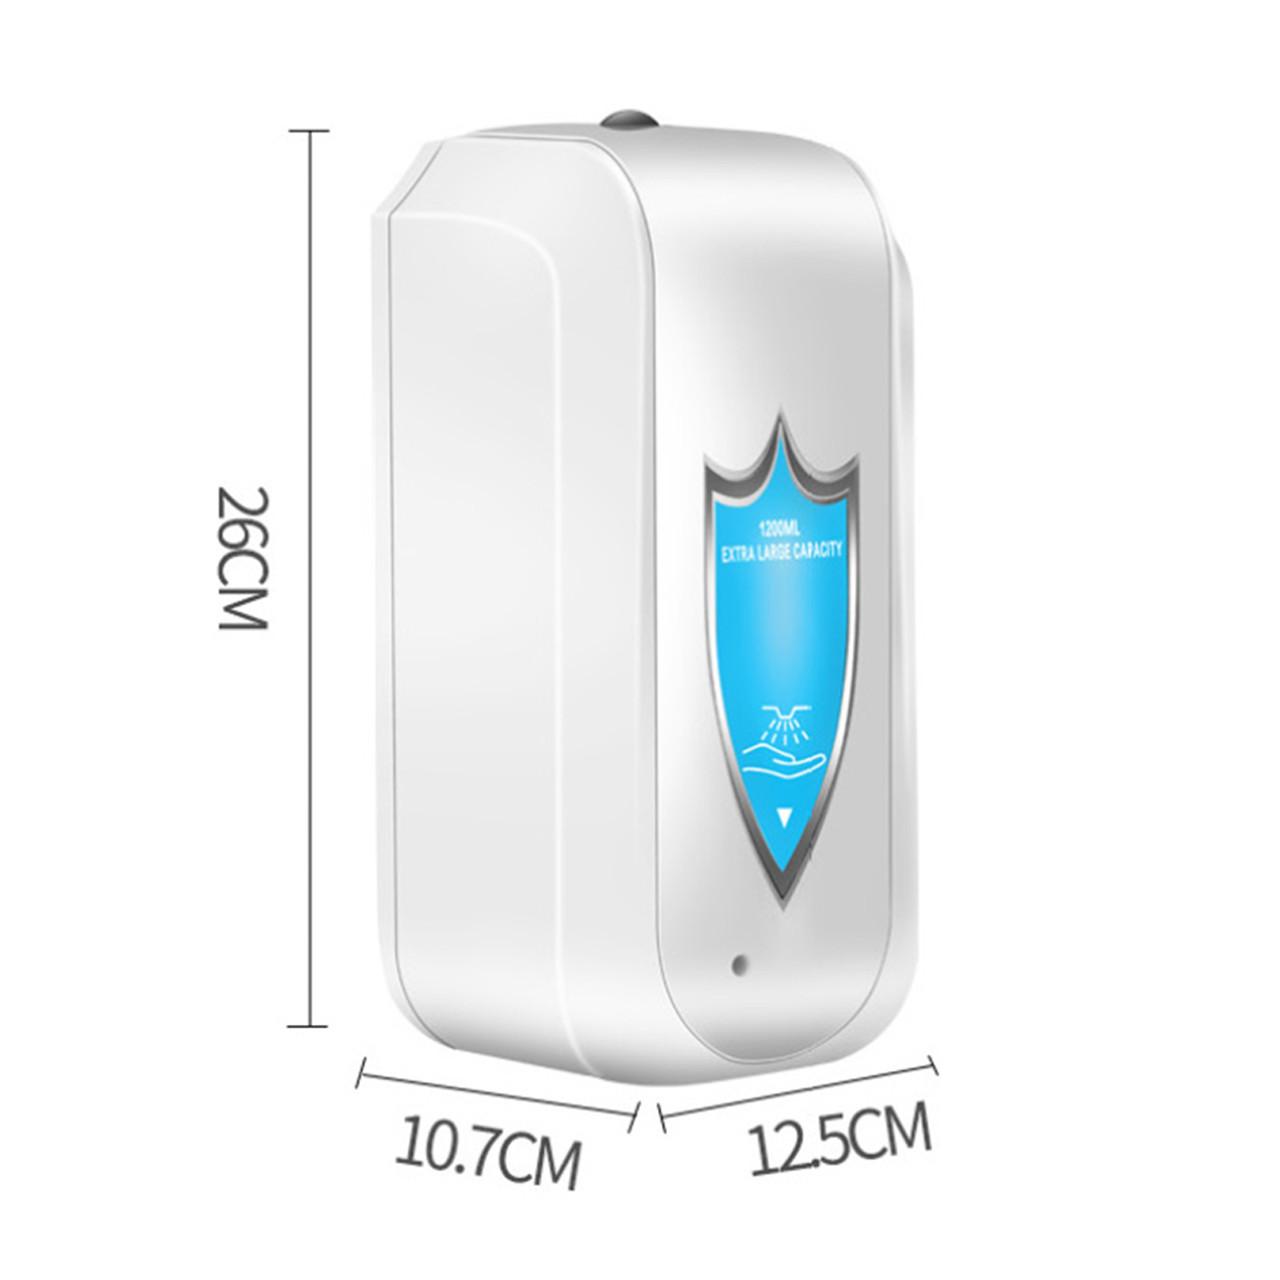 Сенсорный дозатор GL9003 для антисептика (белый) 1200ml